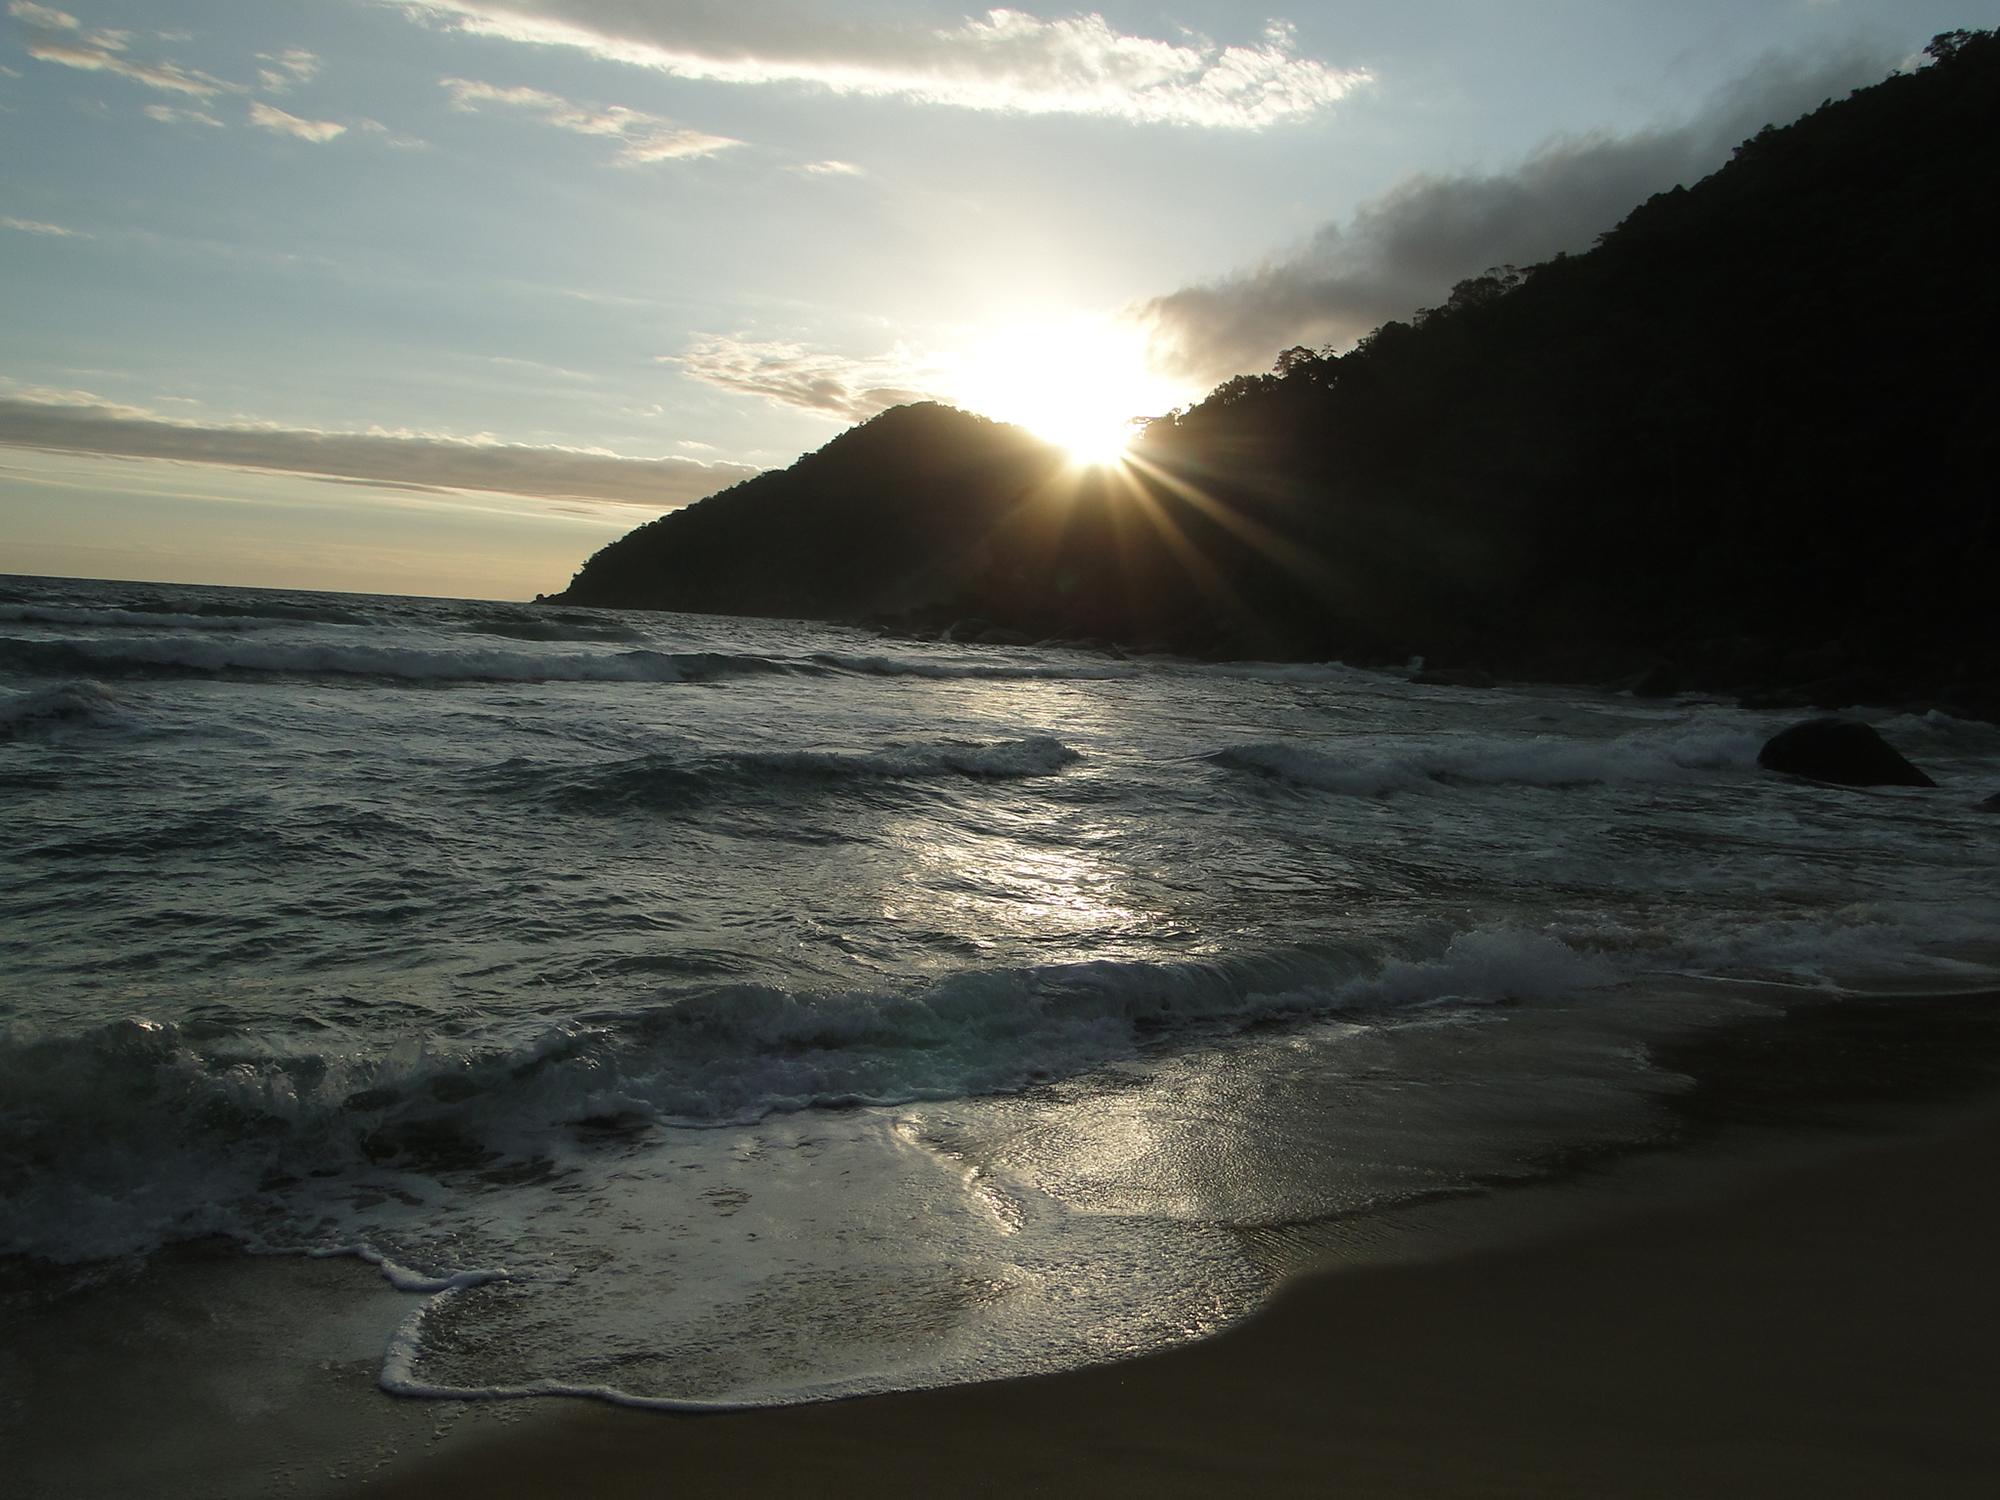 Entardecer na Praia do Sono, Paraty (RJ)